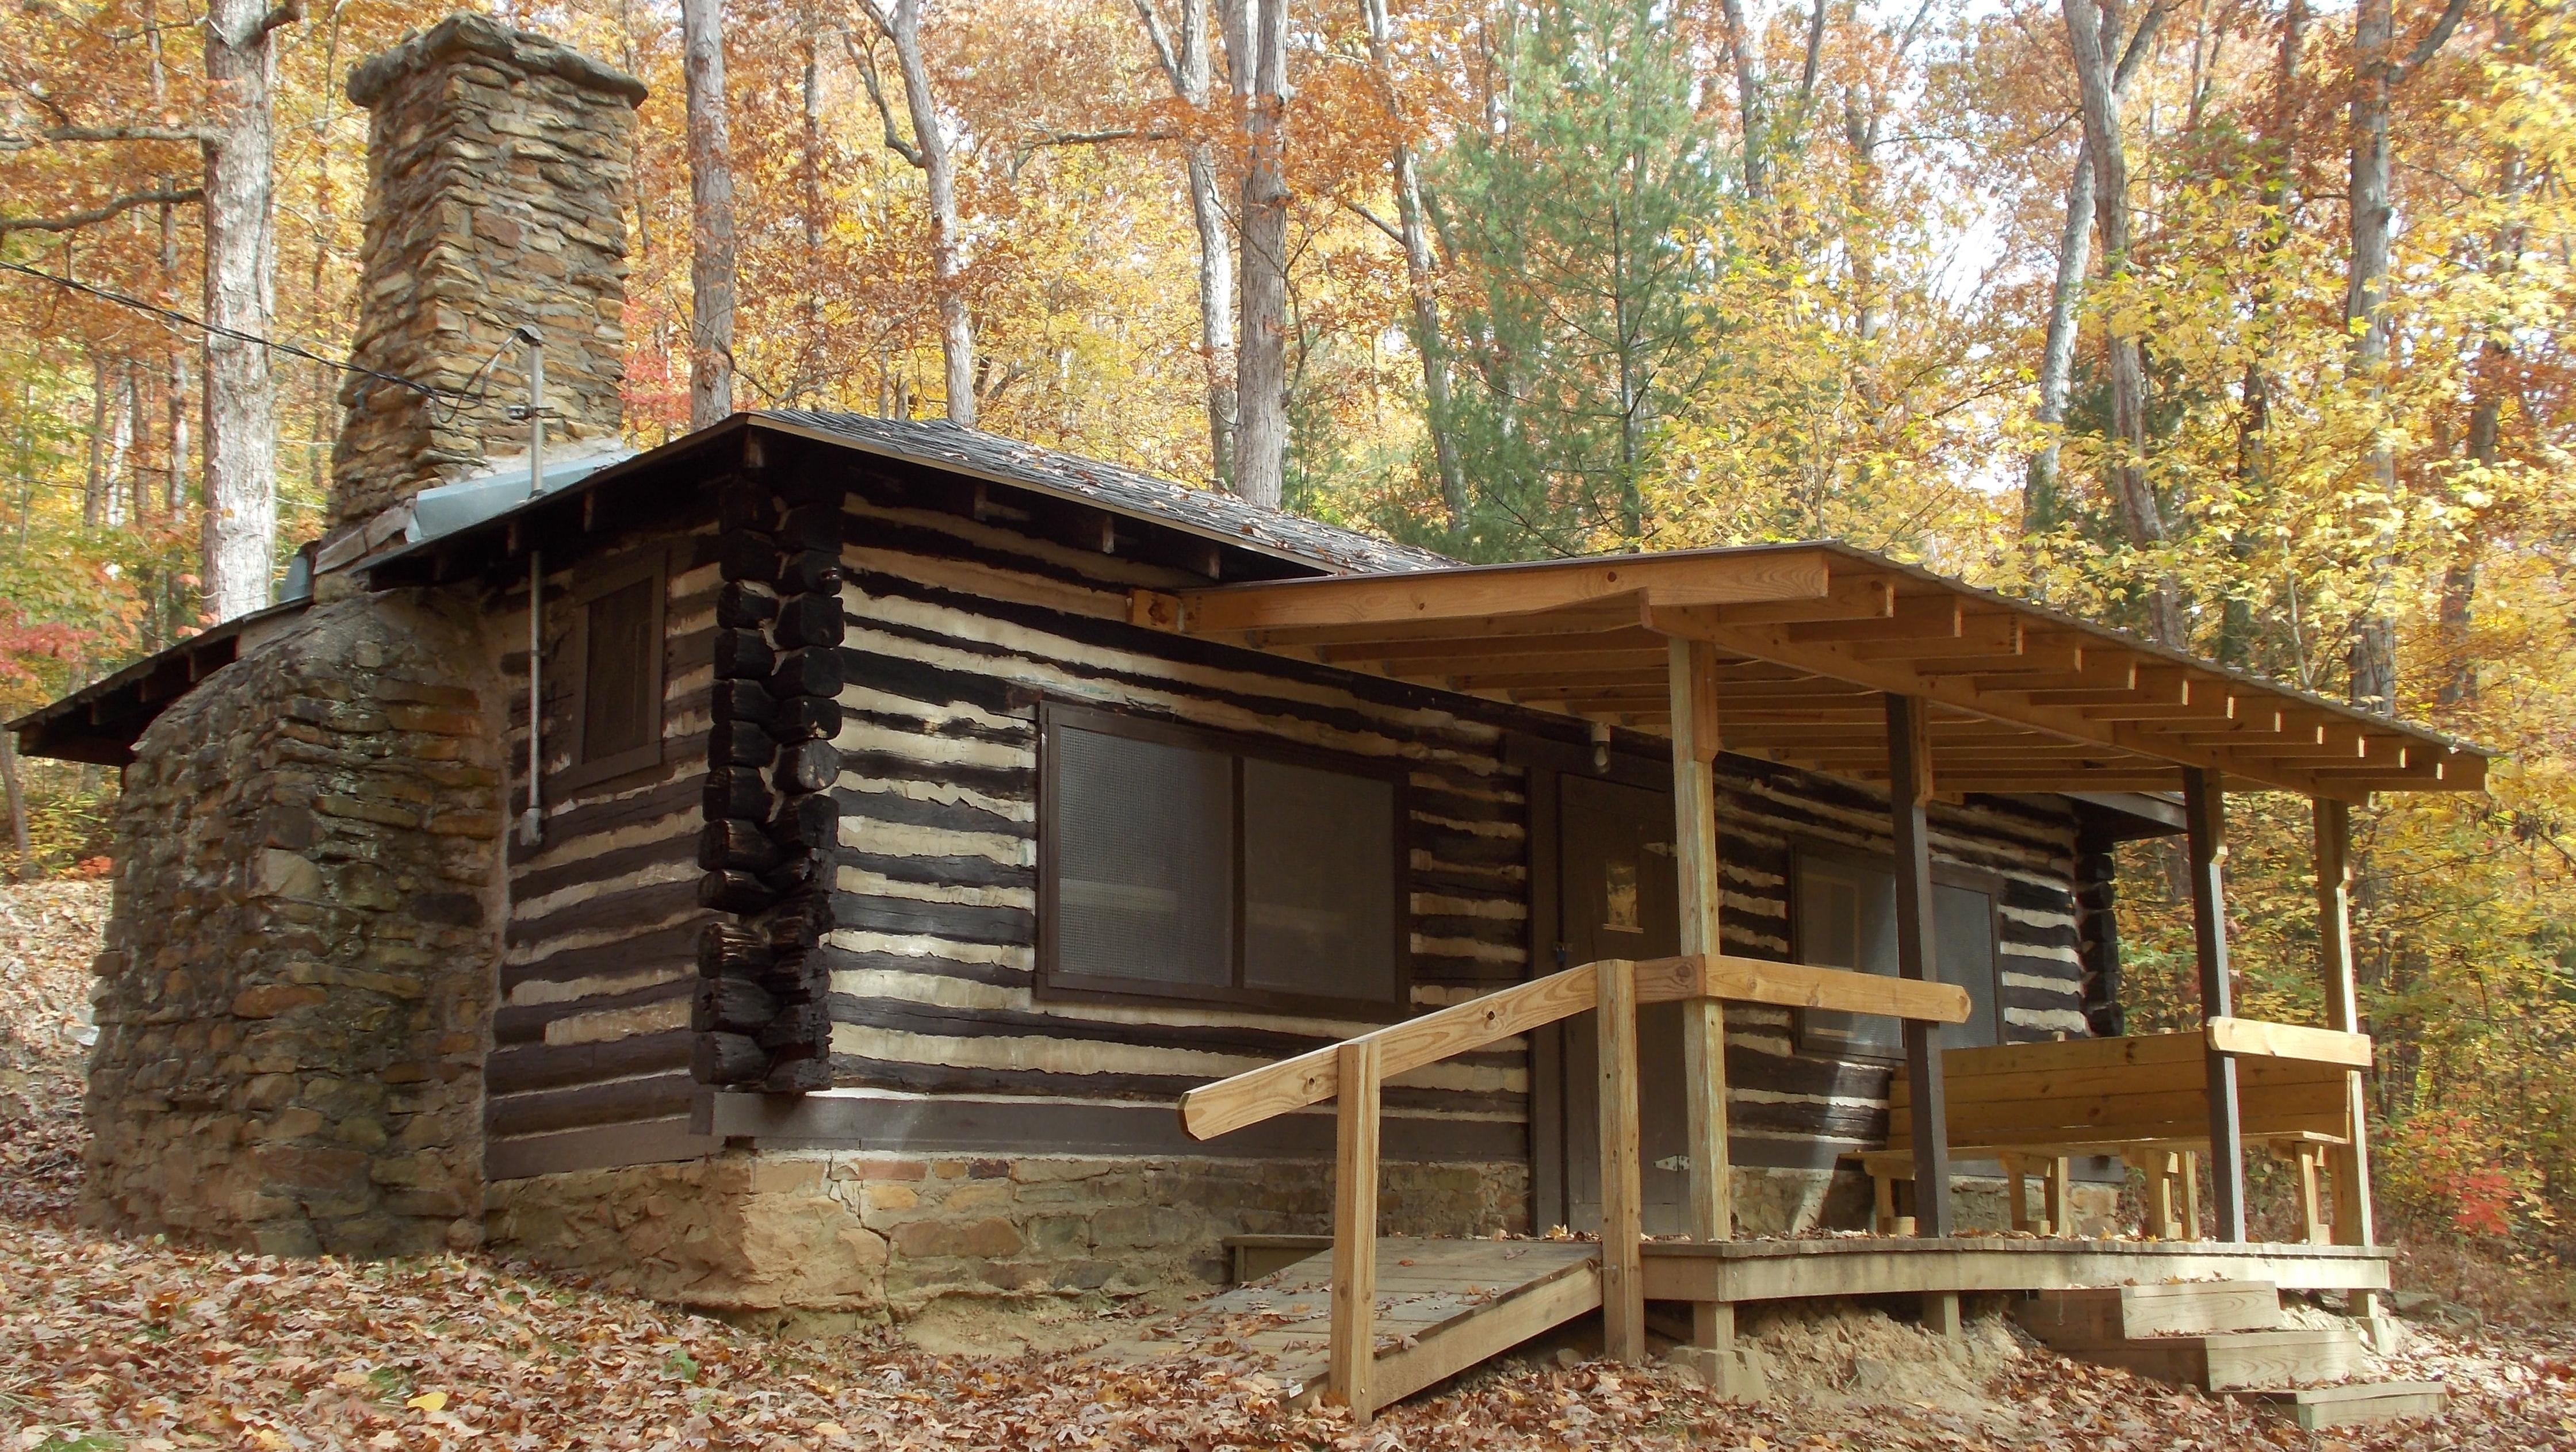 unstainedcabin series sunrise options log deluxe in salem ohio pricing hunter cabins supreme cabin